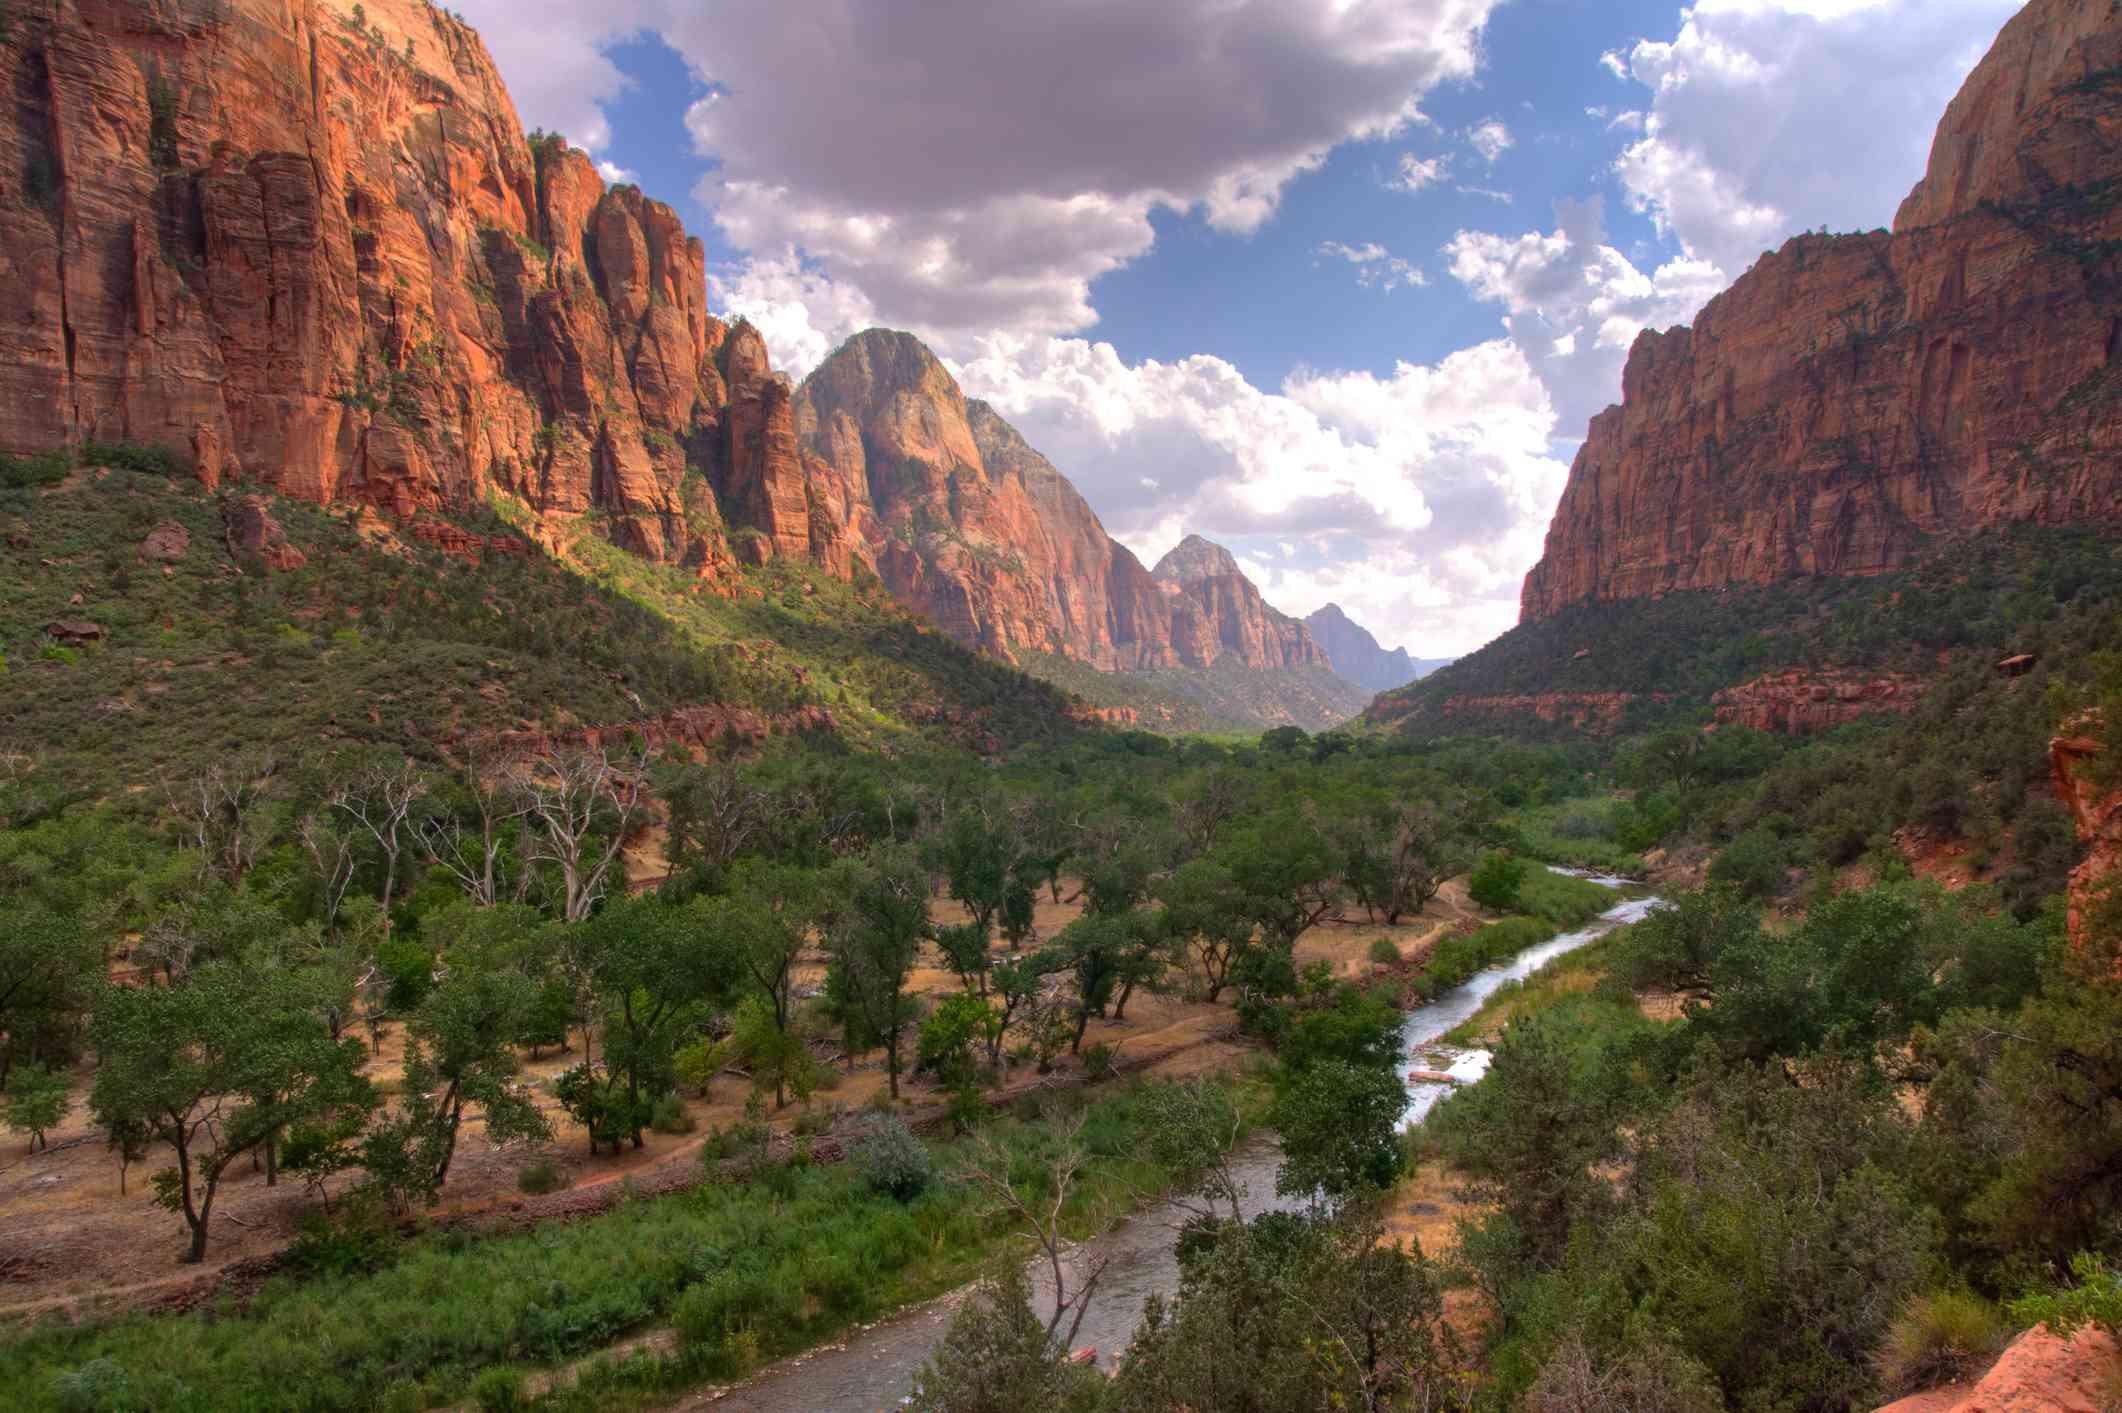 Greenery inside Zion National Park